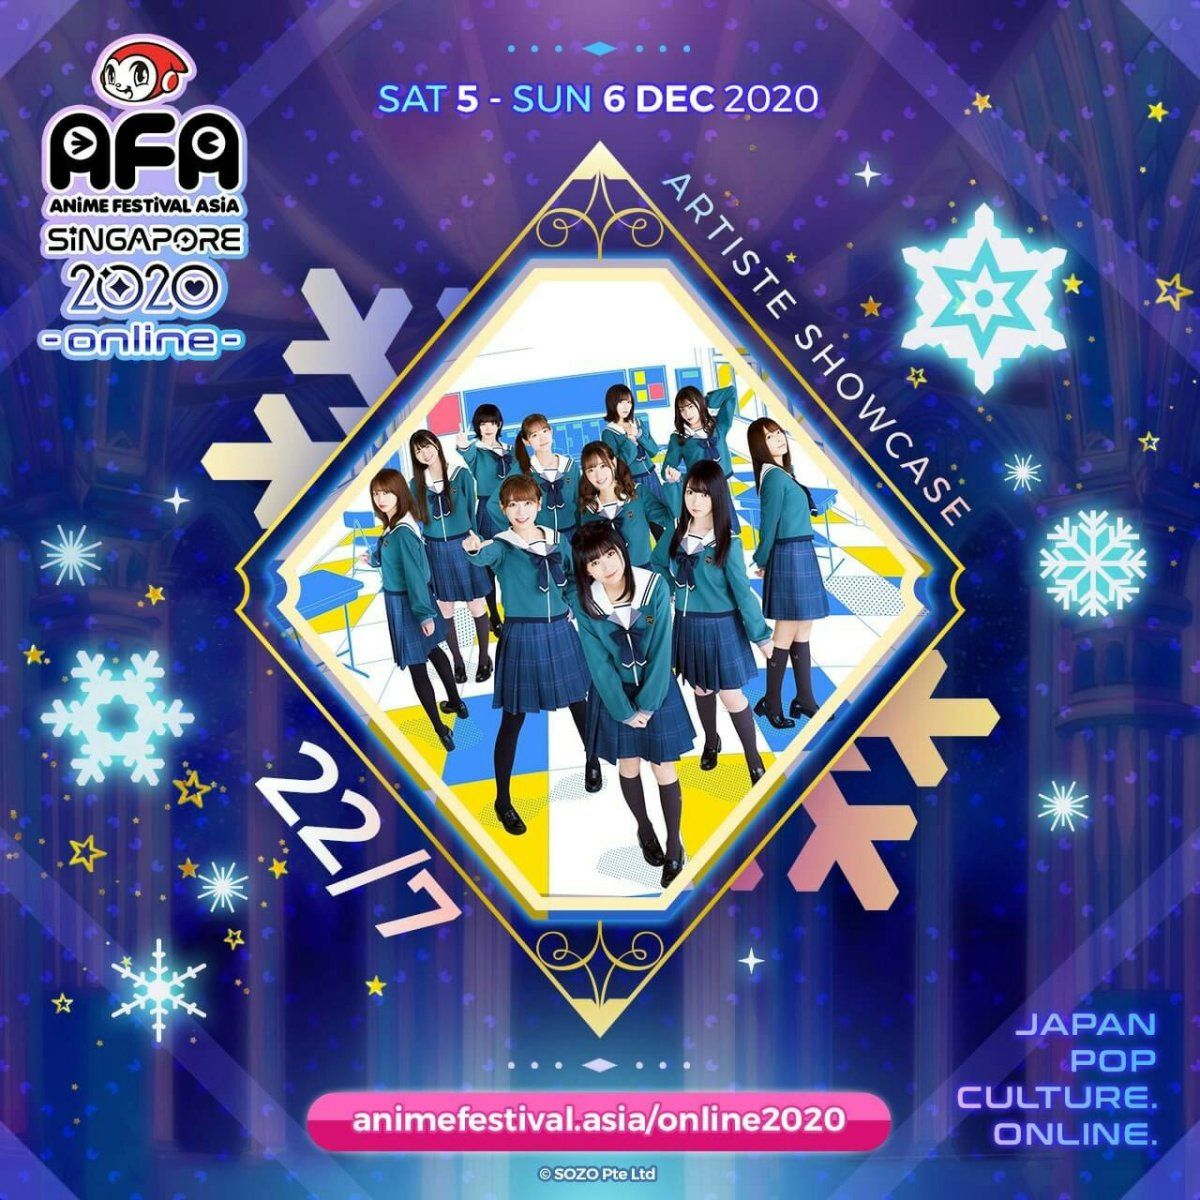 Japan Idol Group 22/7, Moona Hoshinova, Ayaka Ohashi, dan Lebih Banyak Lagi Musisi & Idol Favorit Tampil di Stage Virtual AFA! 3